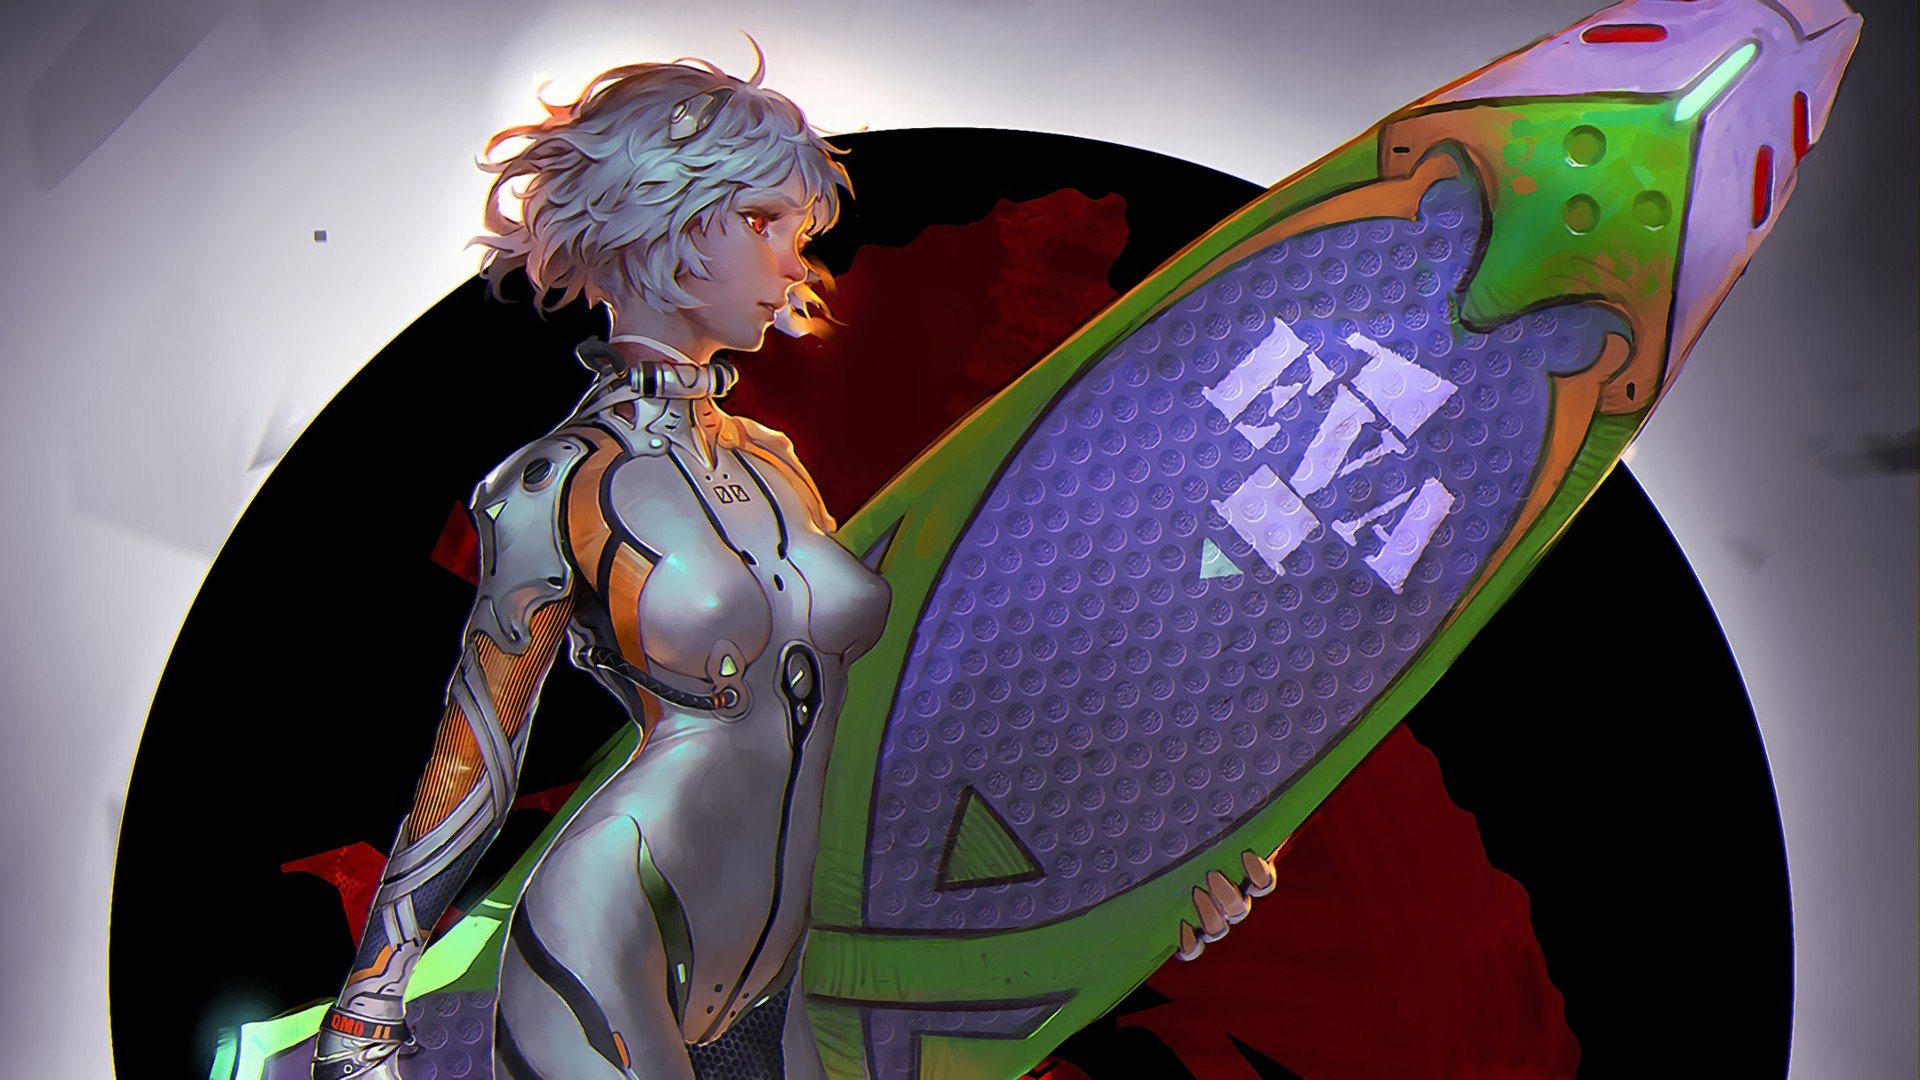 Anime 1920x1080 Neon Genesis Evangelion Eva Ayanami Rei surfboards